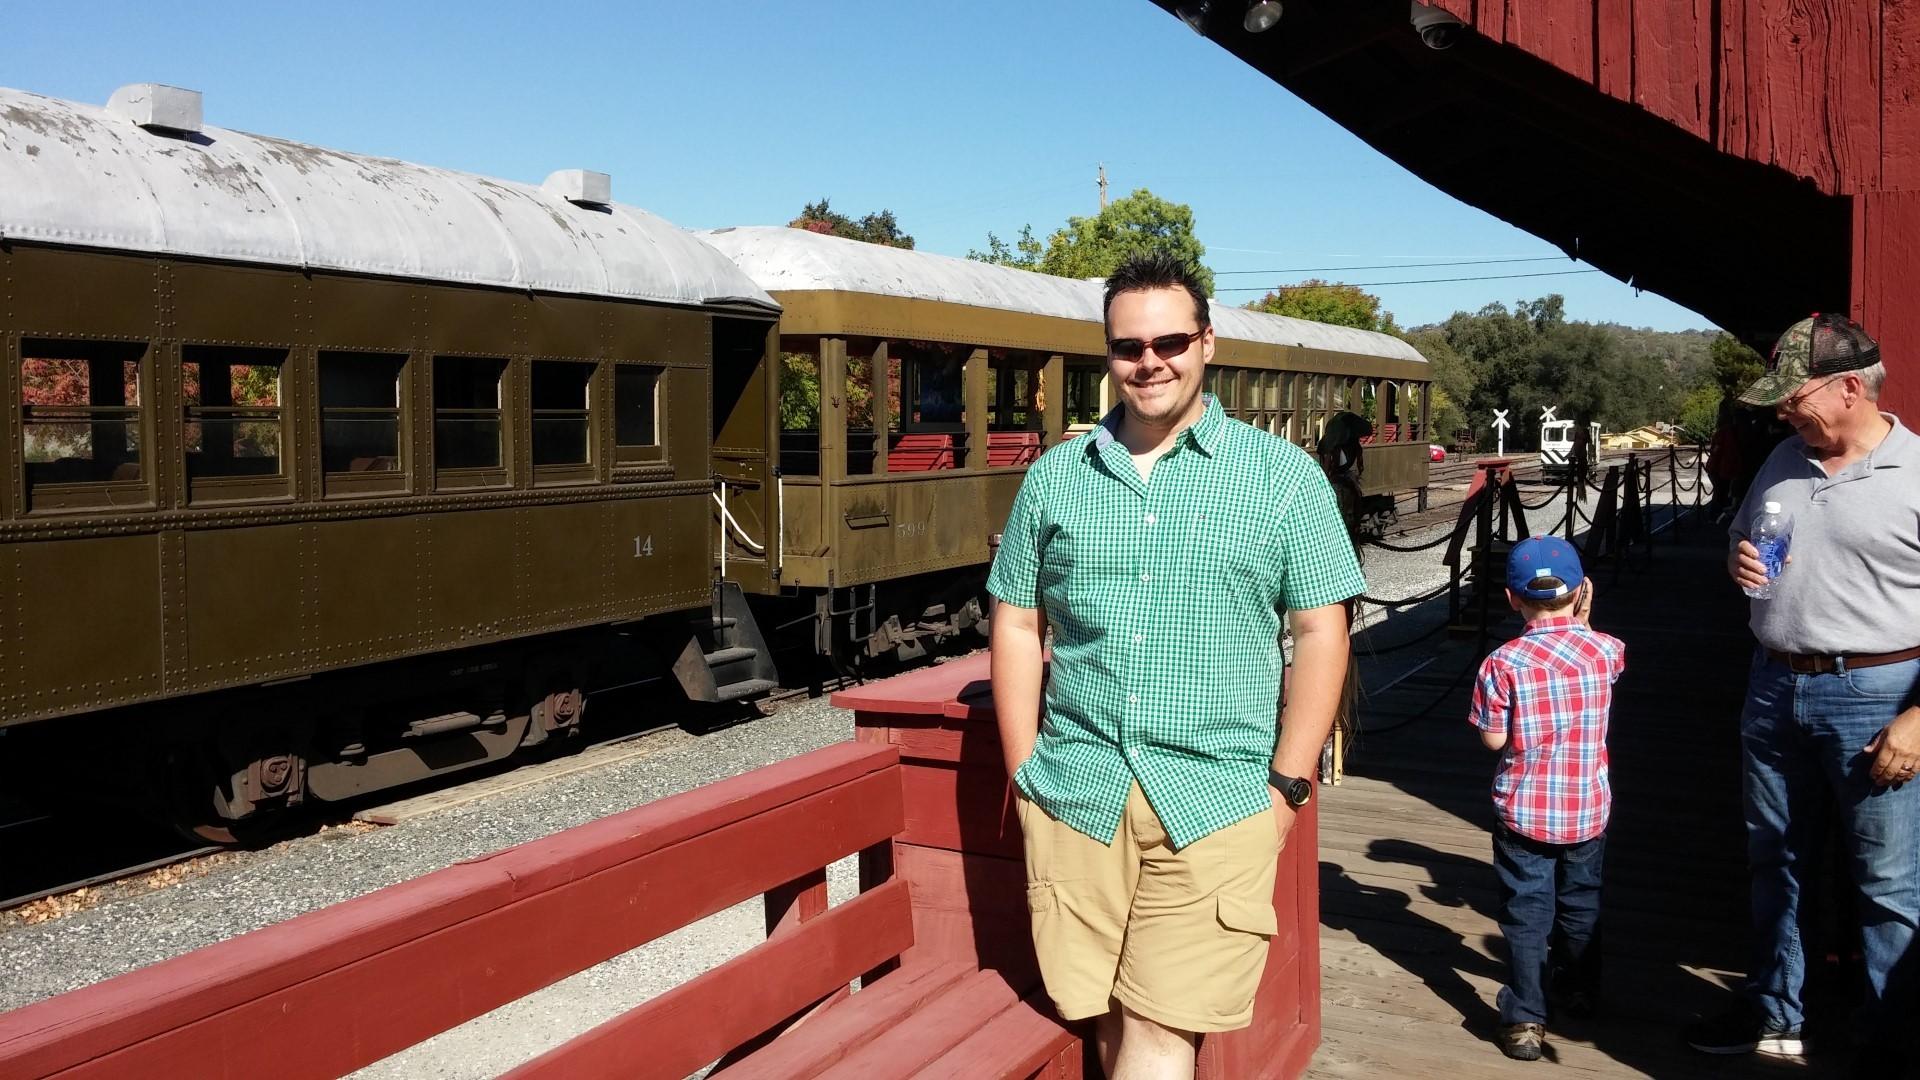 USA Tag 10: Jamestown, Railtown, San Francisco (2014-10-05)